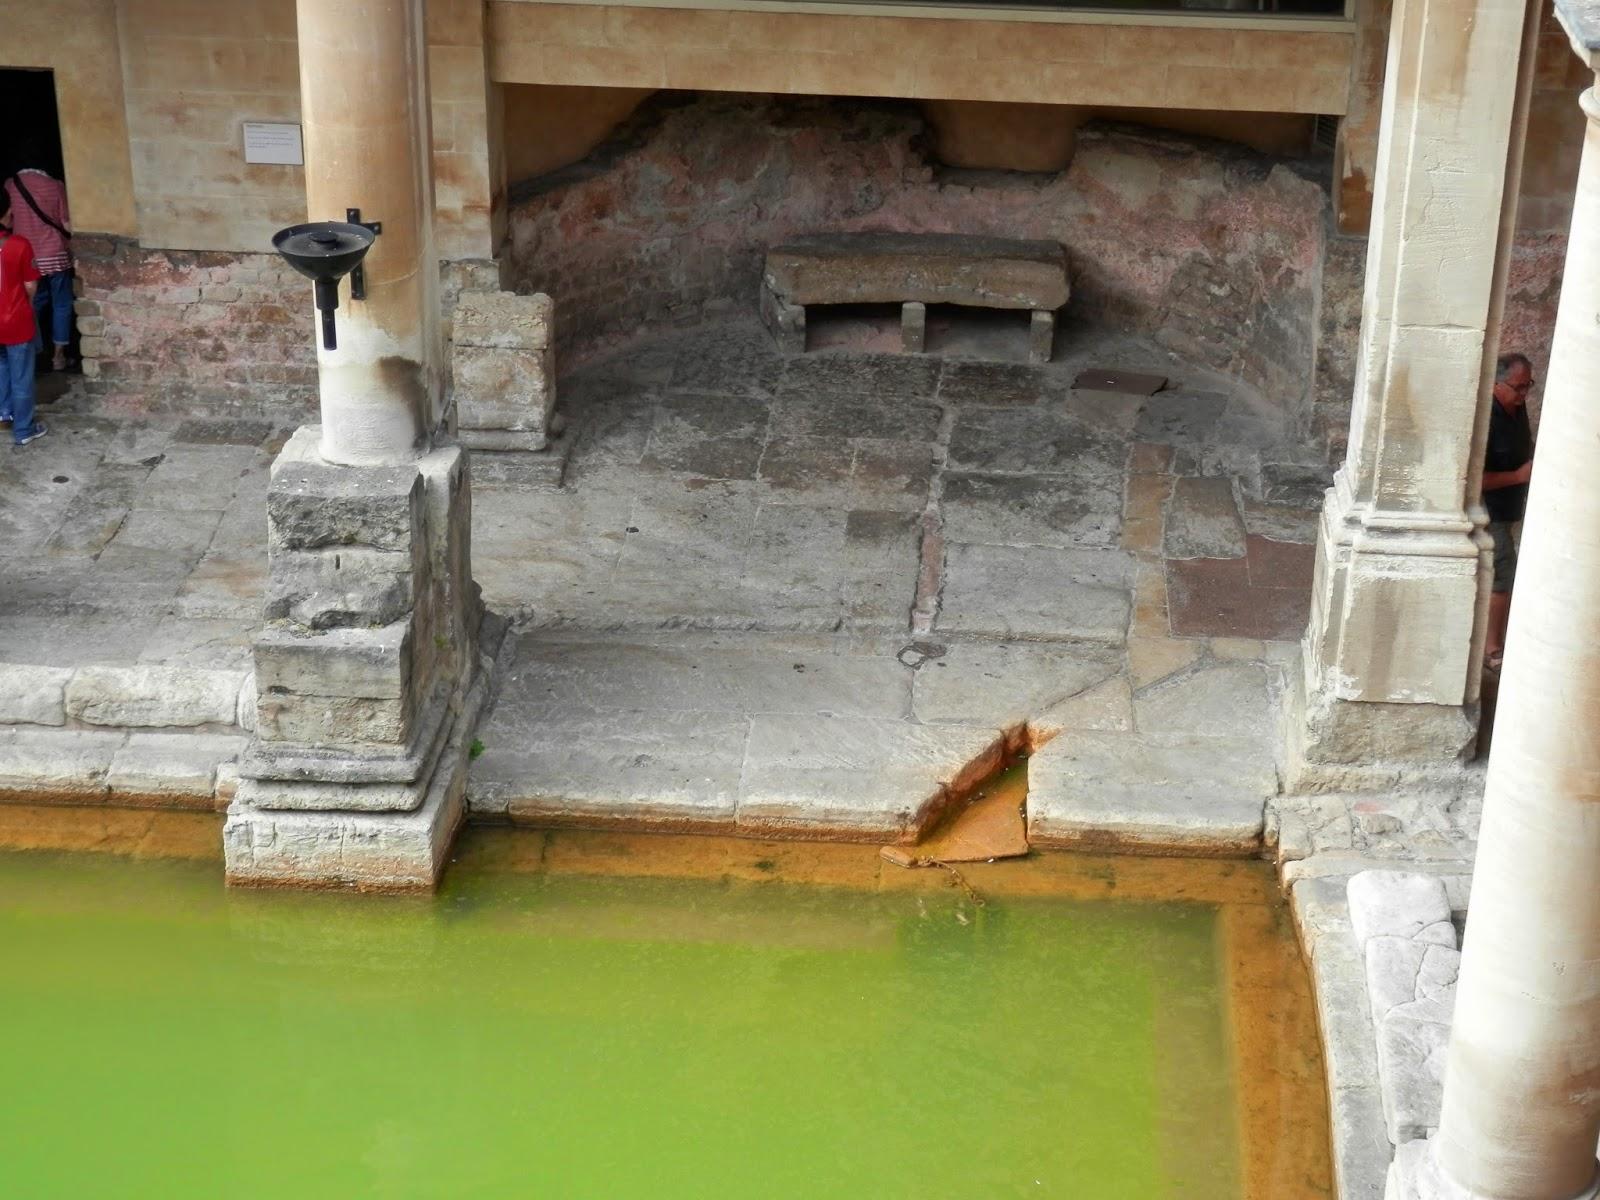 Baños Romanos Bath Inglaterra:Roman baths of Bath (England) / Termas romanas de Bath (Inglaterra